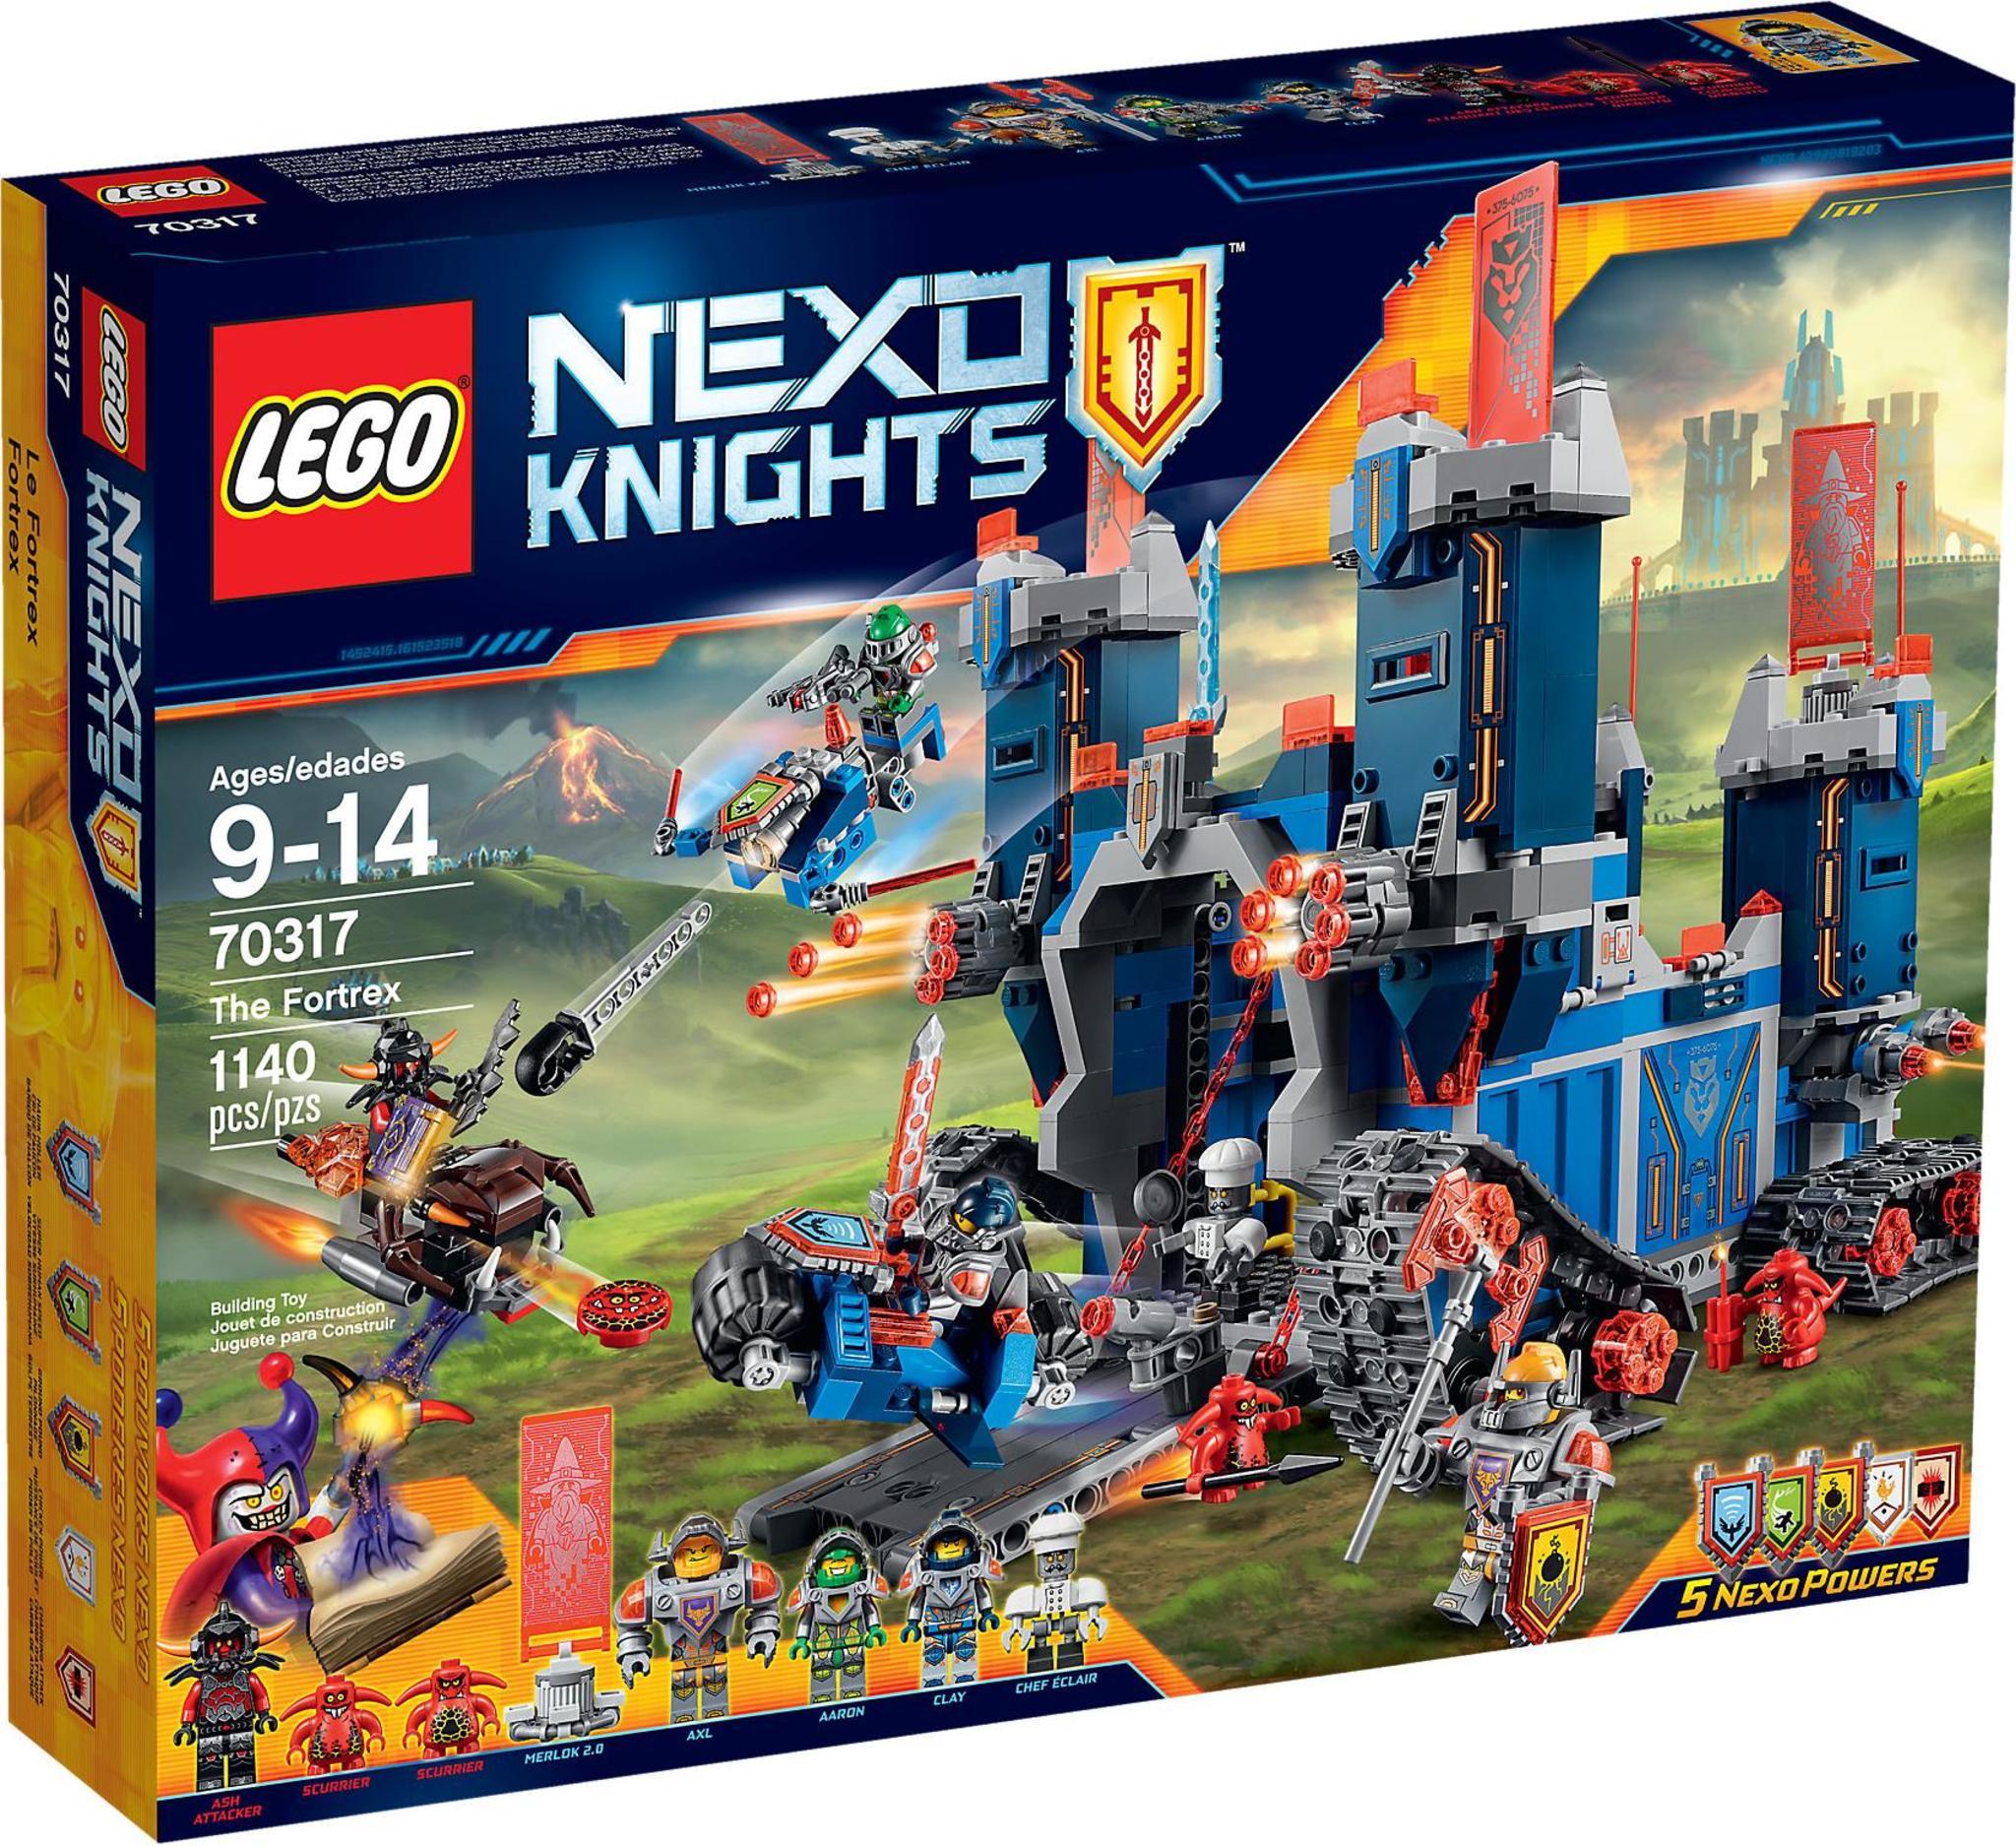 Knights Fortrex The Lego 70317 Nexo oQrdWxeCB